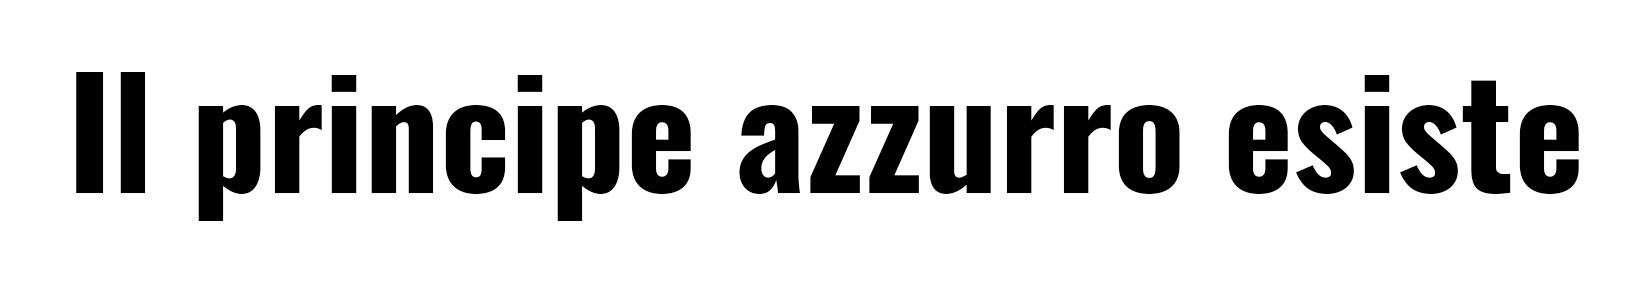 https://fabita-web.s3.amazonaws.com/uploads/home_page_item_block/image/27/ilprincipeazzurroesiste.png